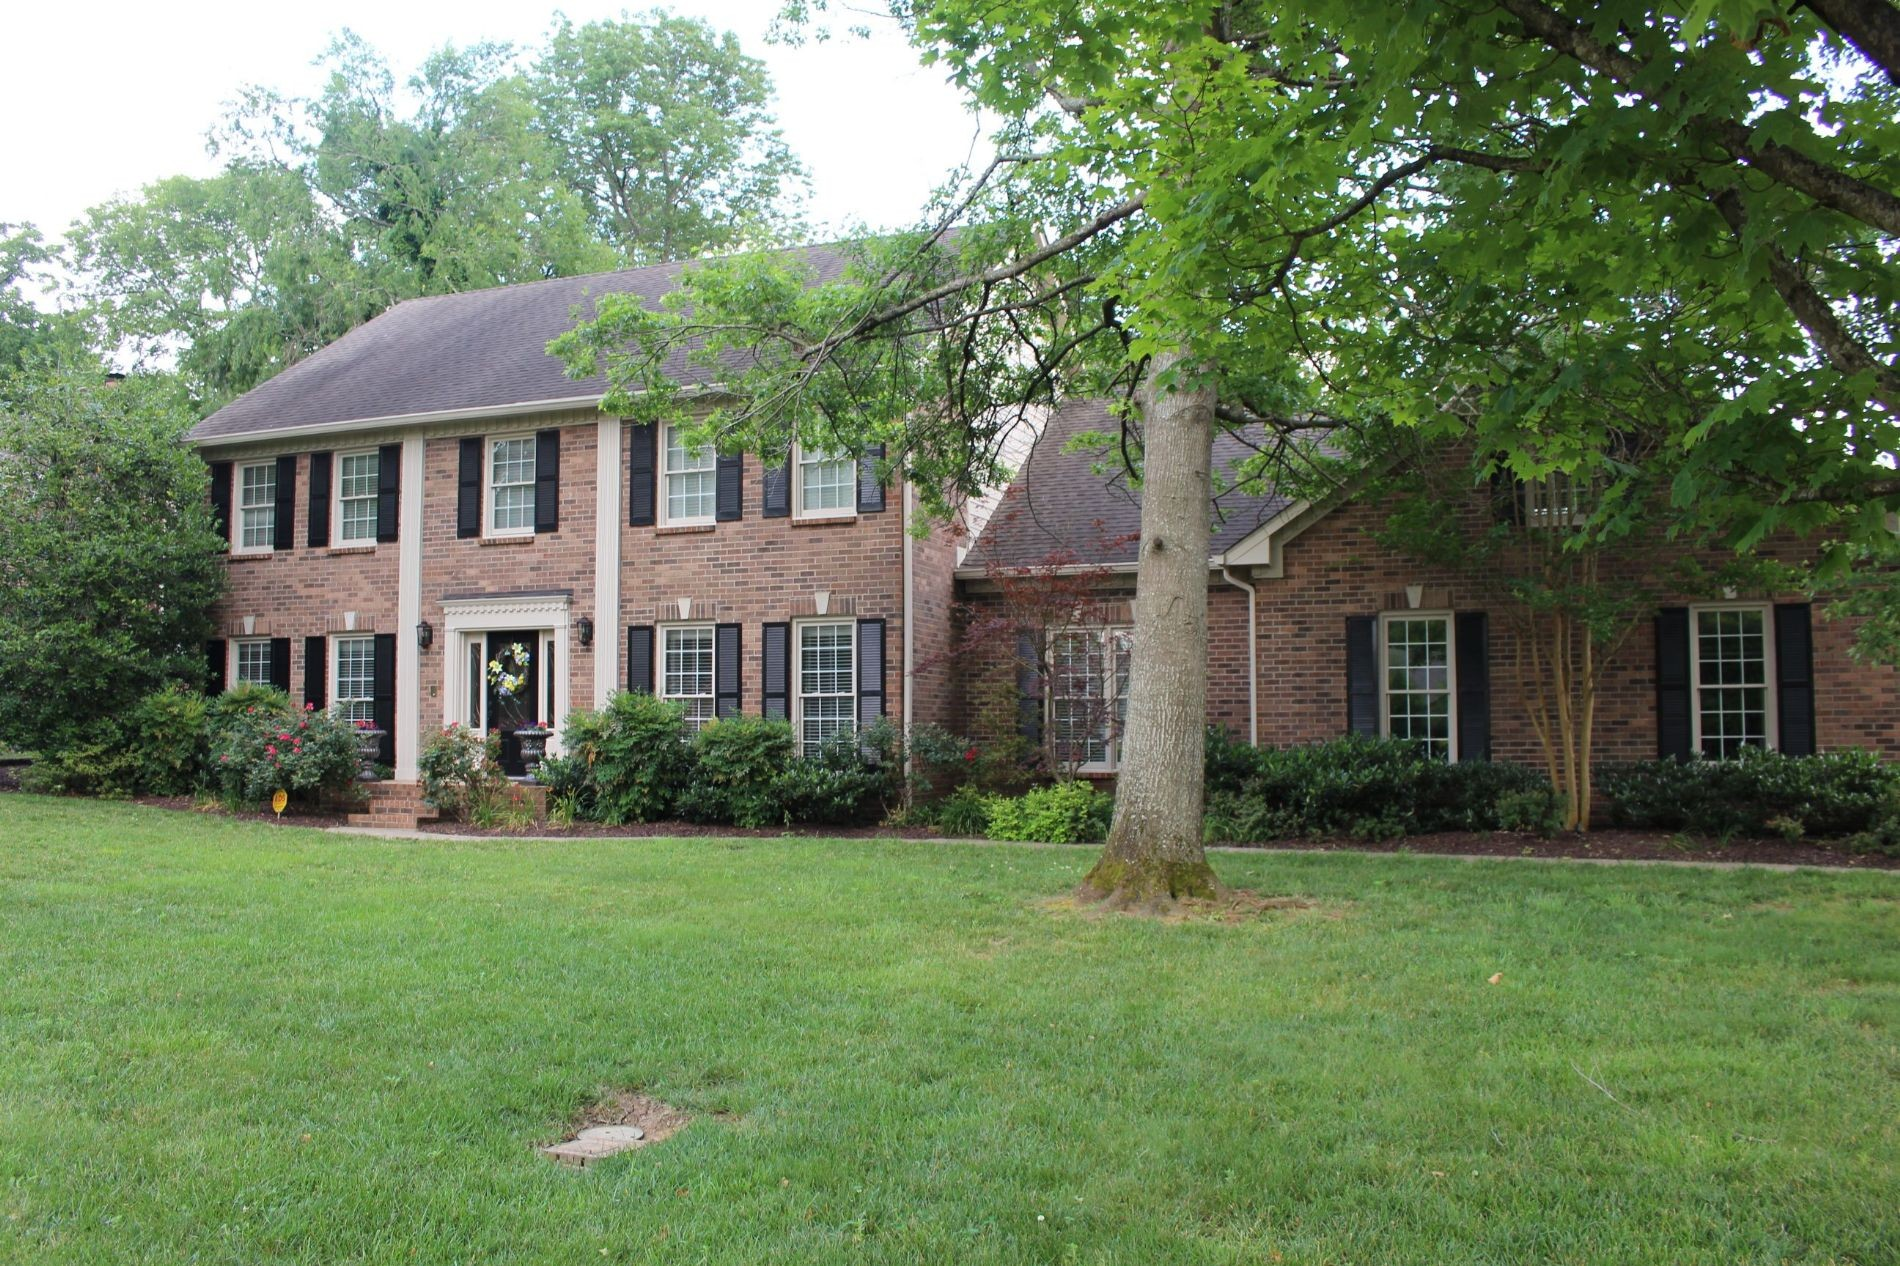 2127 Riverbend Dr Property Photo - Murfreesboro, TN real estate listing